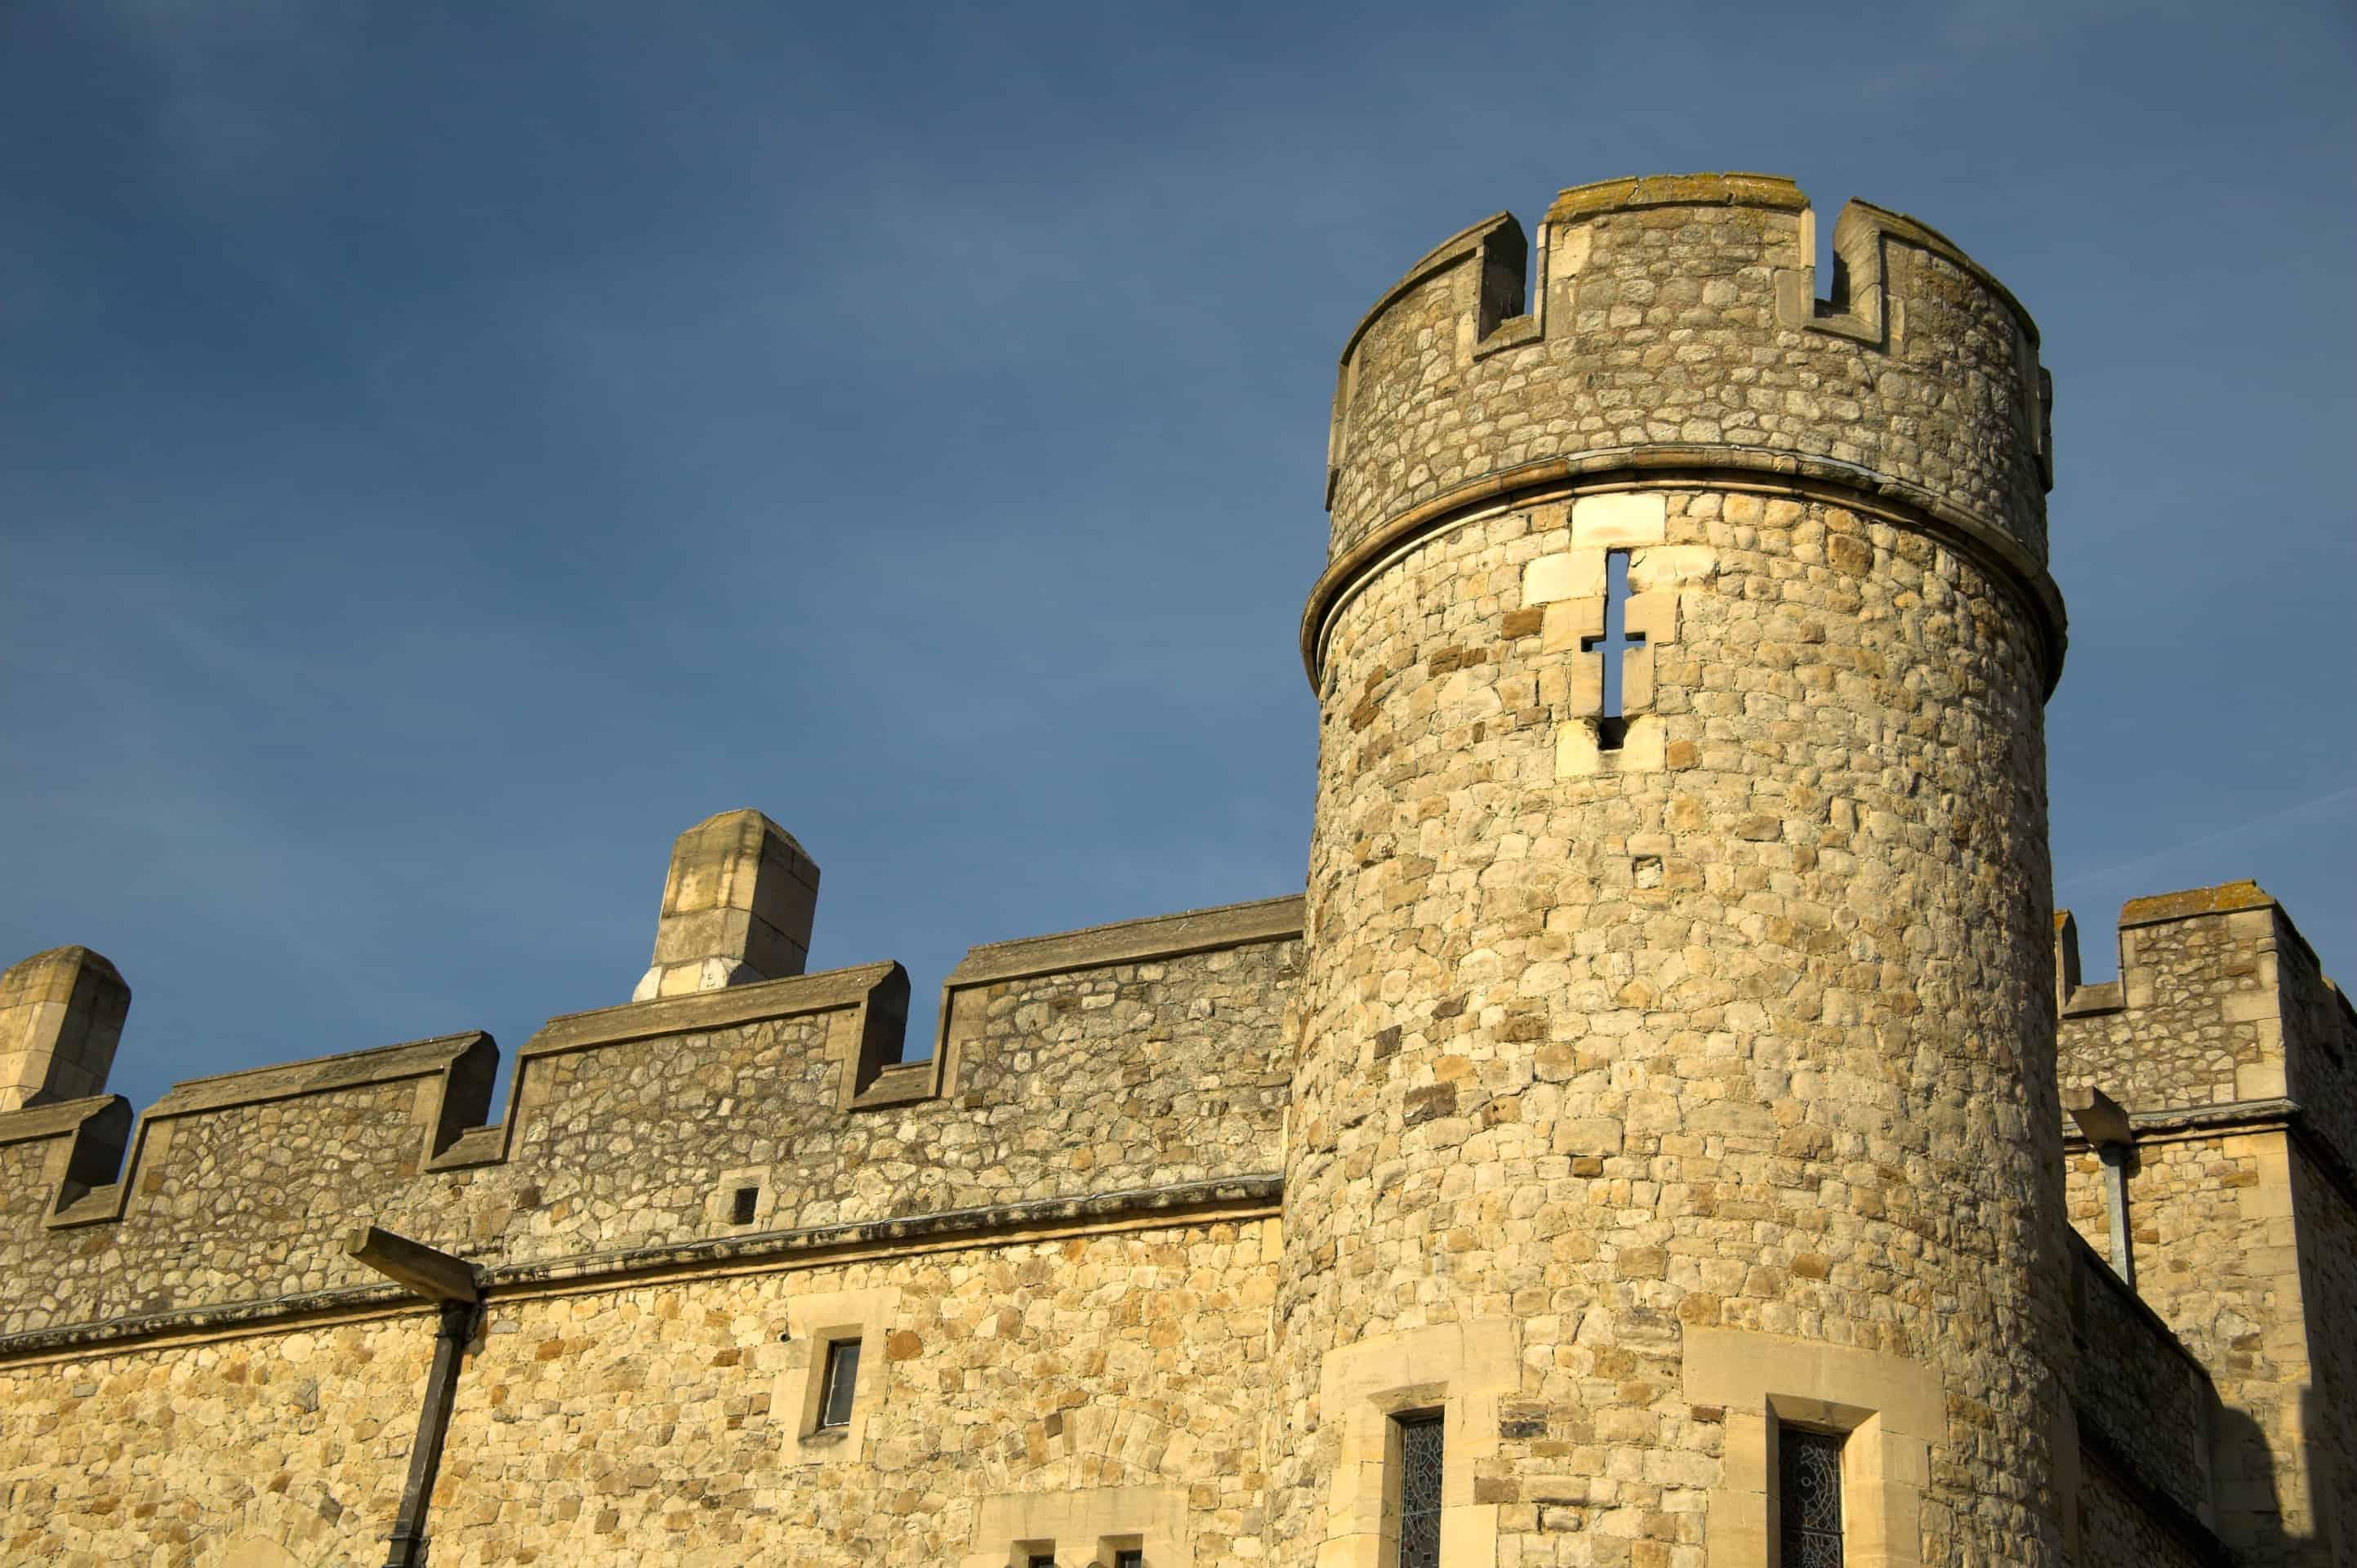 St Thomas's Tower